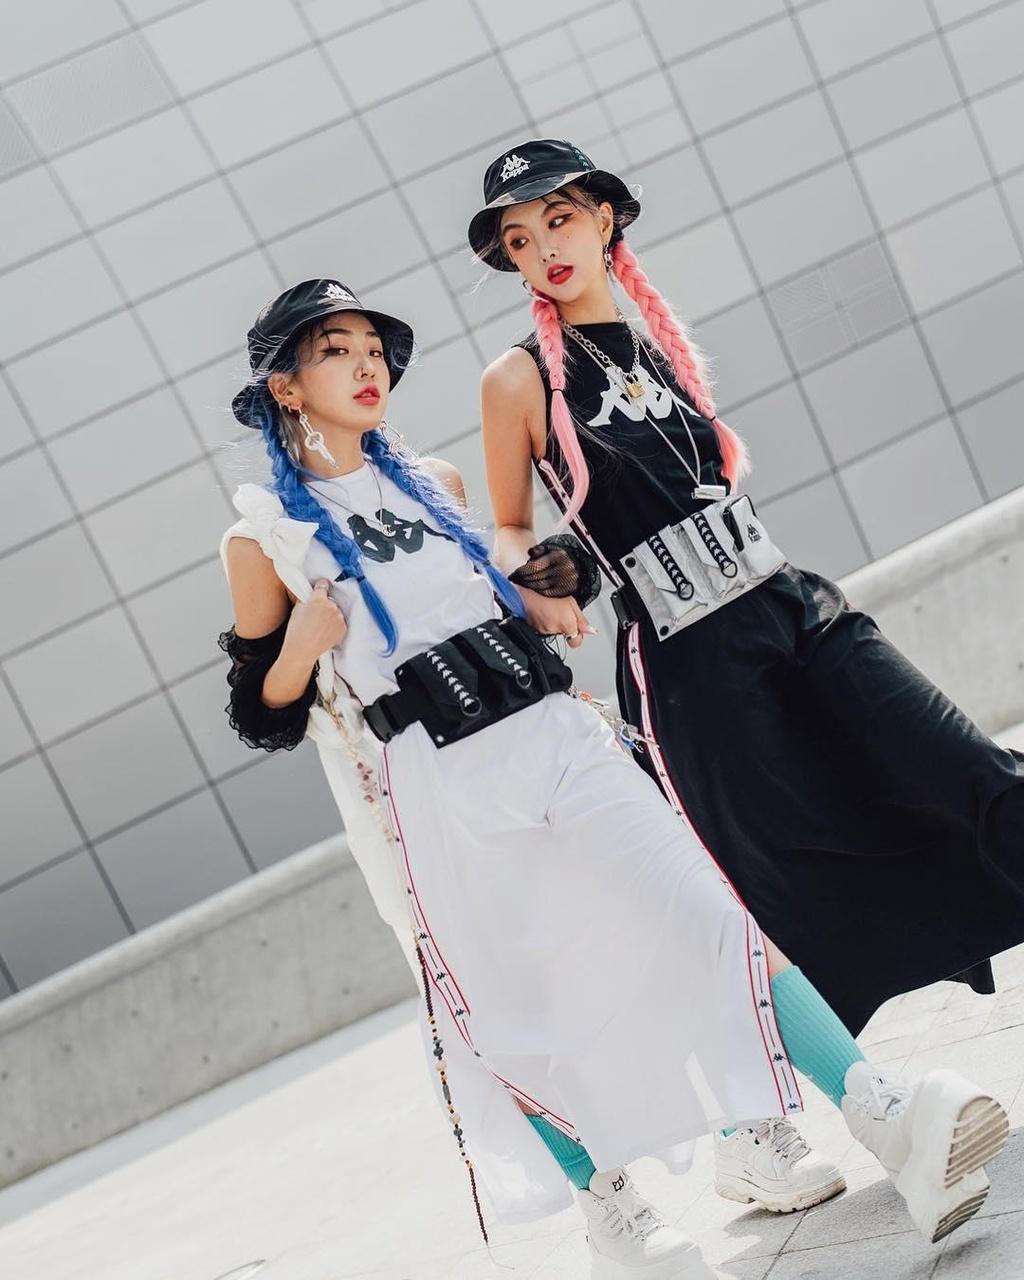 Hinh anh A quan The Face tai Seoul Fashion Week len Vogue hinh anh 4